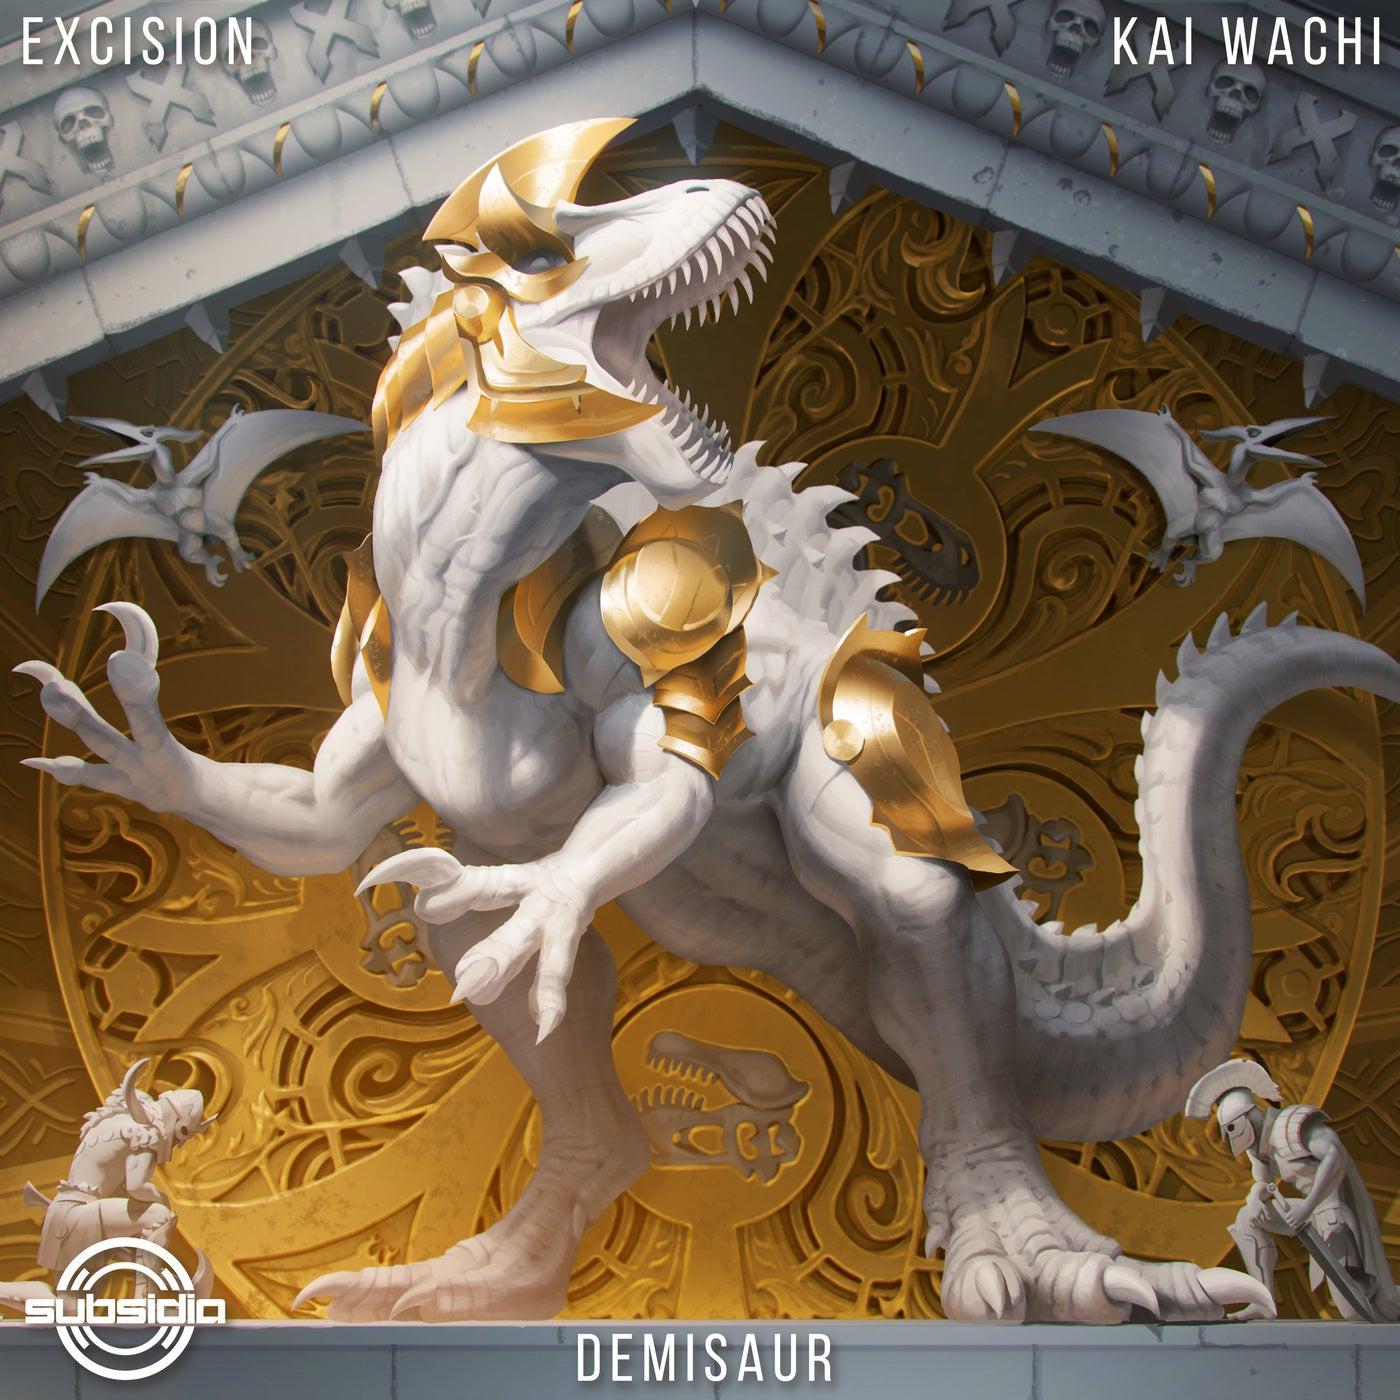 Demisaur (Original Mix)